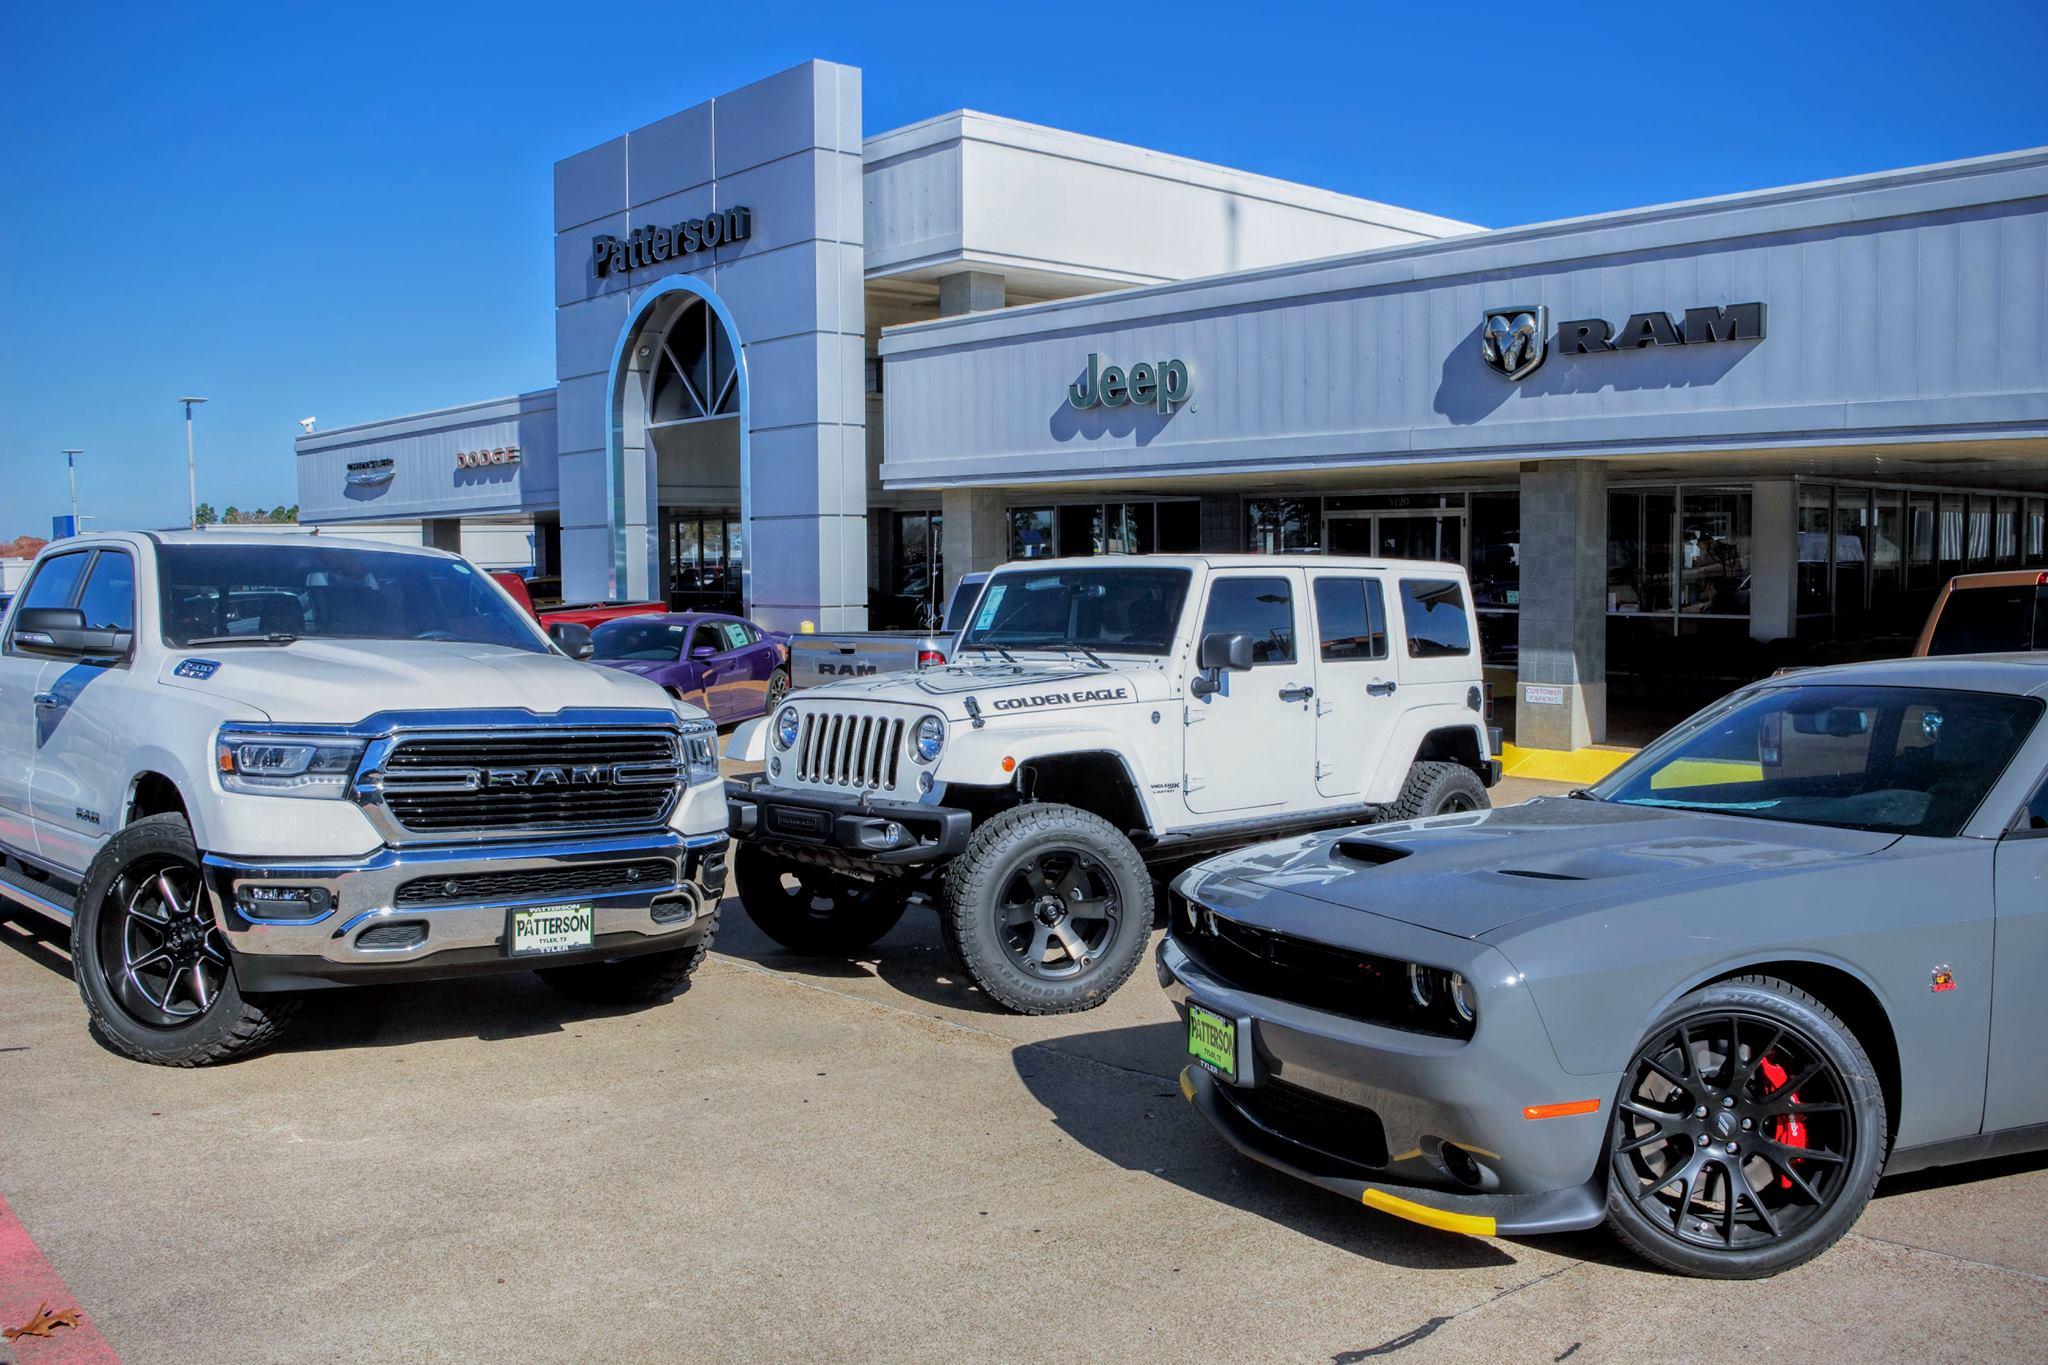 dodge dealership tyler tx Patterson Dodge Chrysler Jeep Ram  Dealership in Tyler